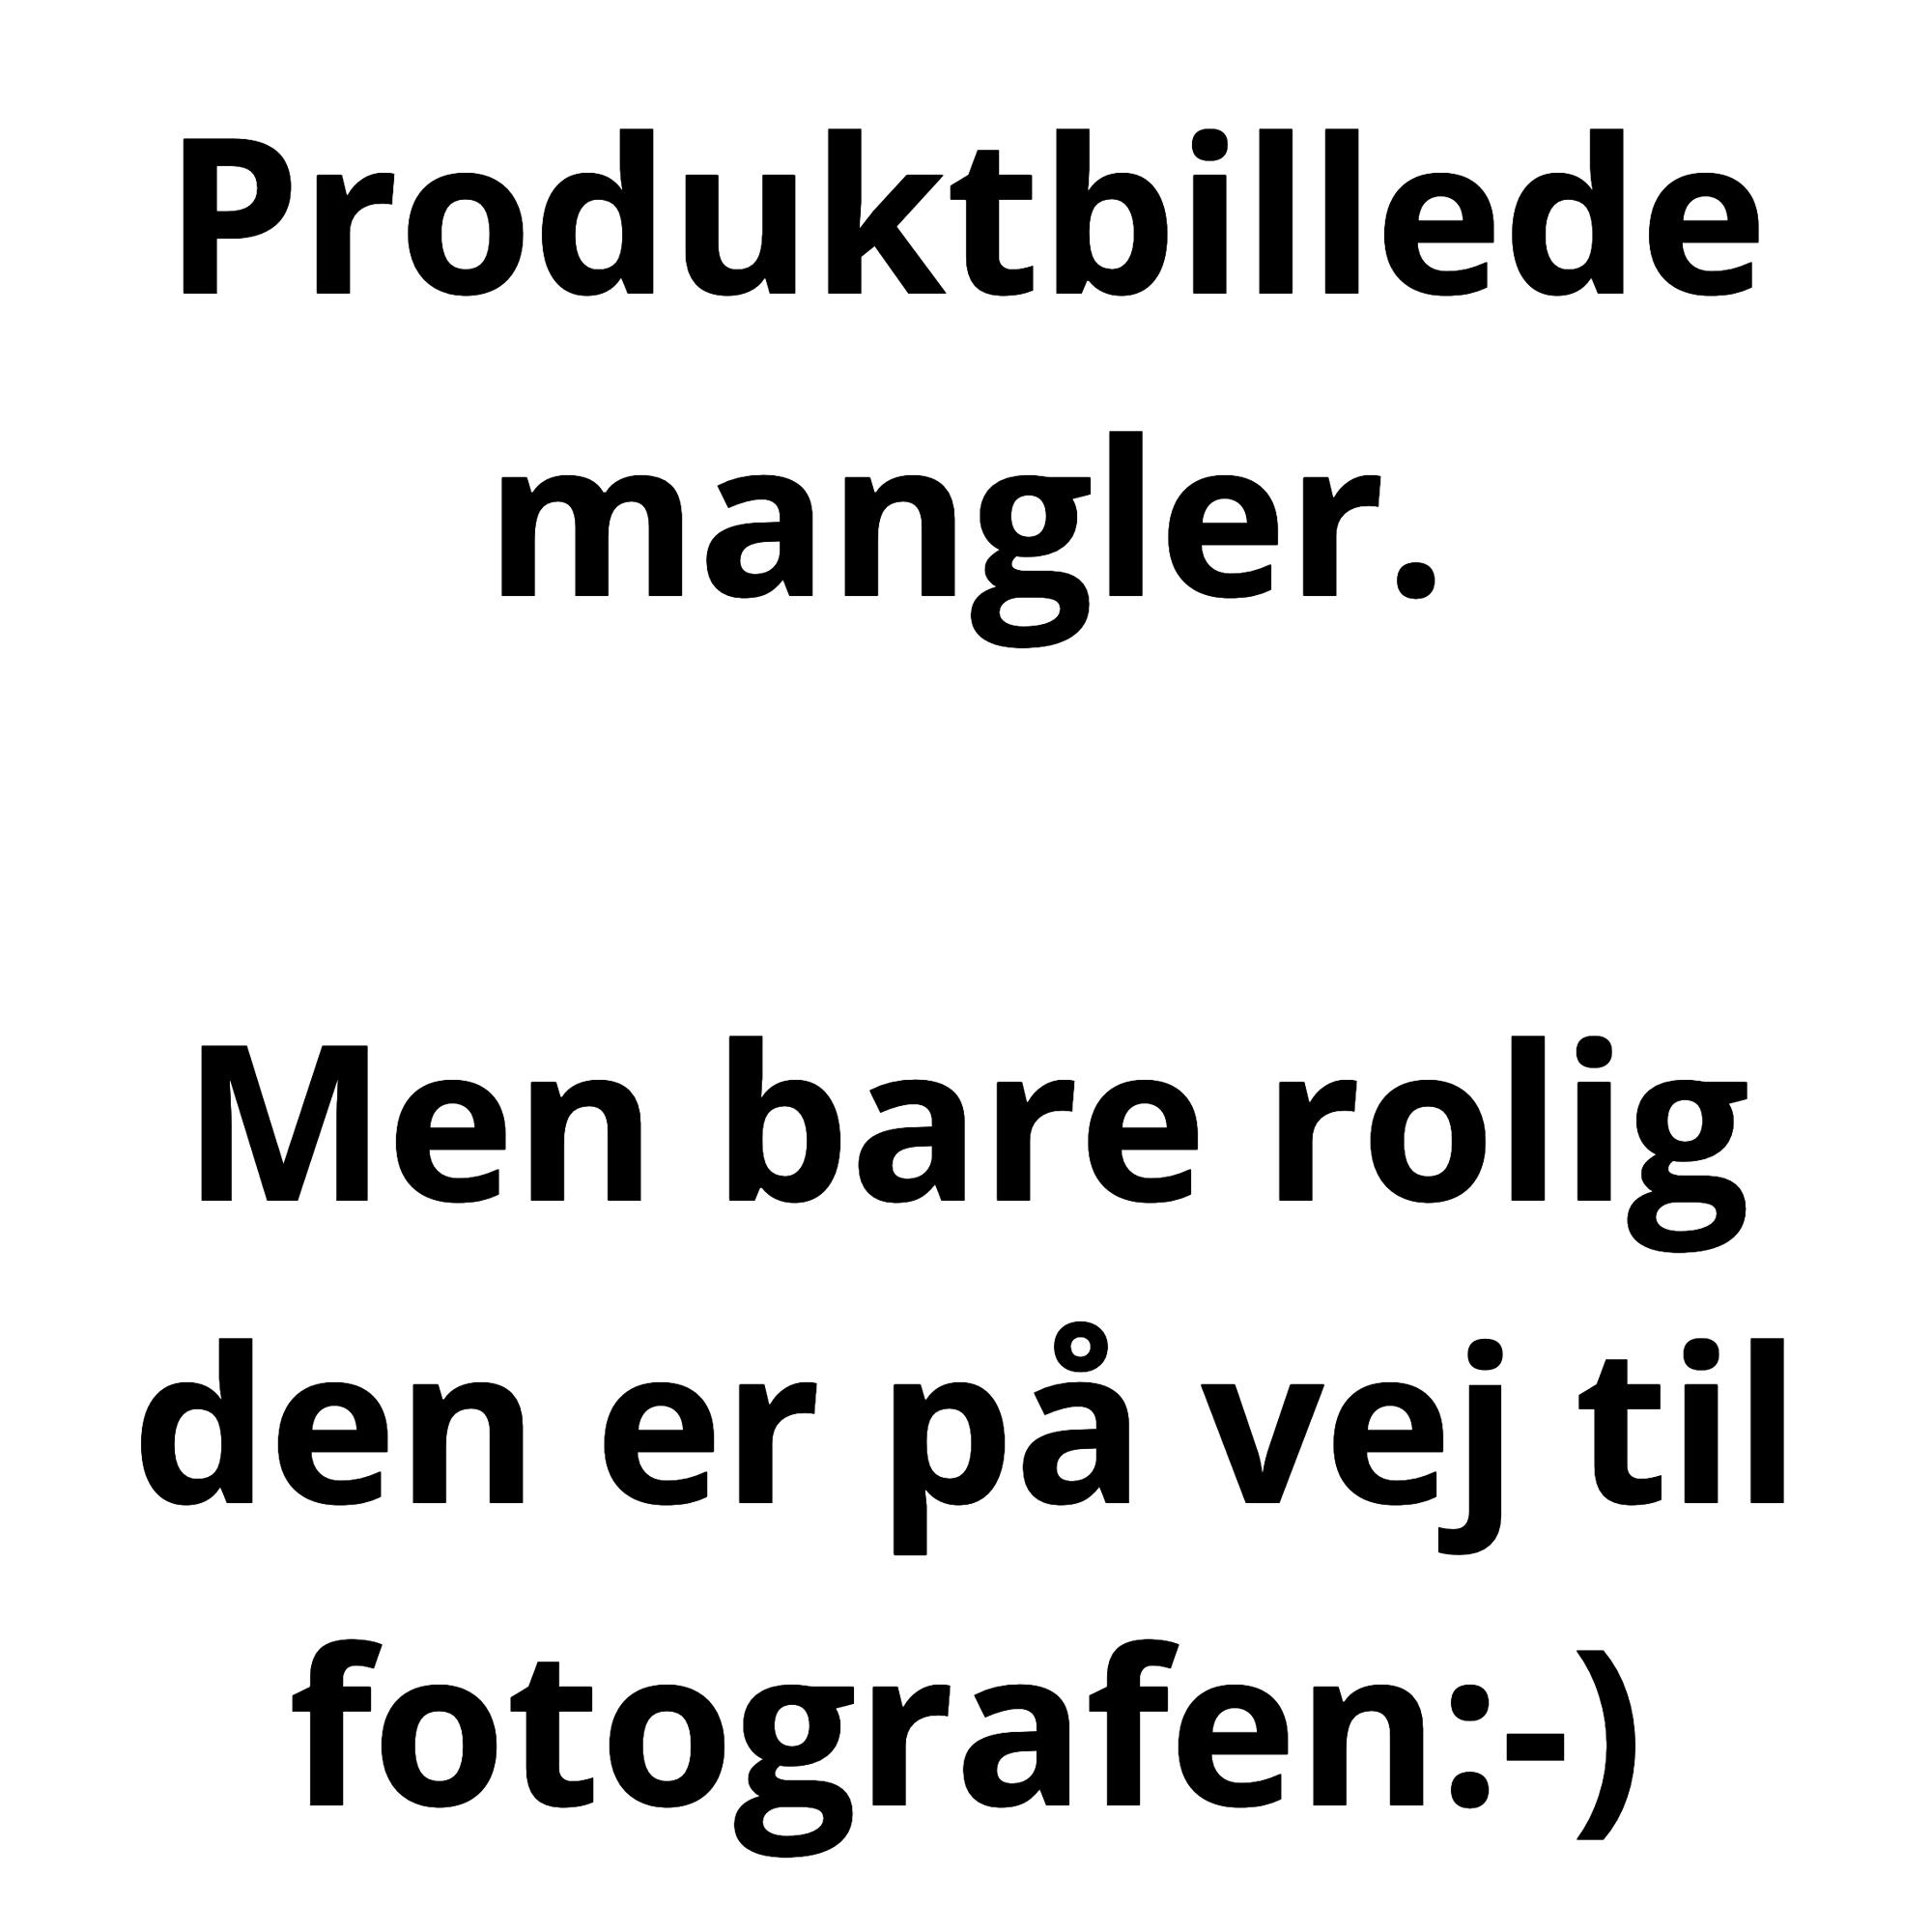 Brodit Aktiv Tablet Mobilholder med cigar adapter til Apple iPad Mini 4 - 521793